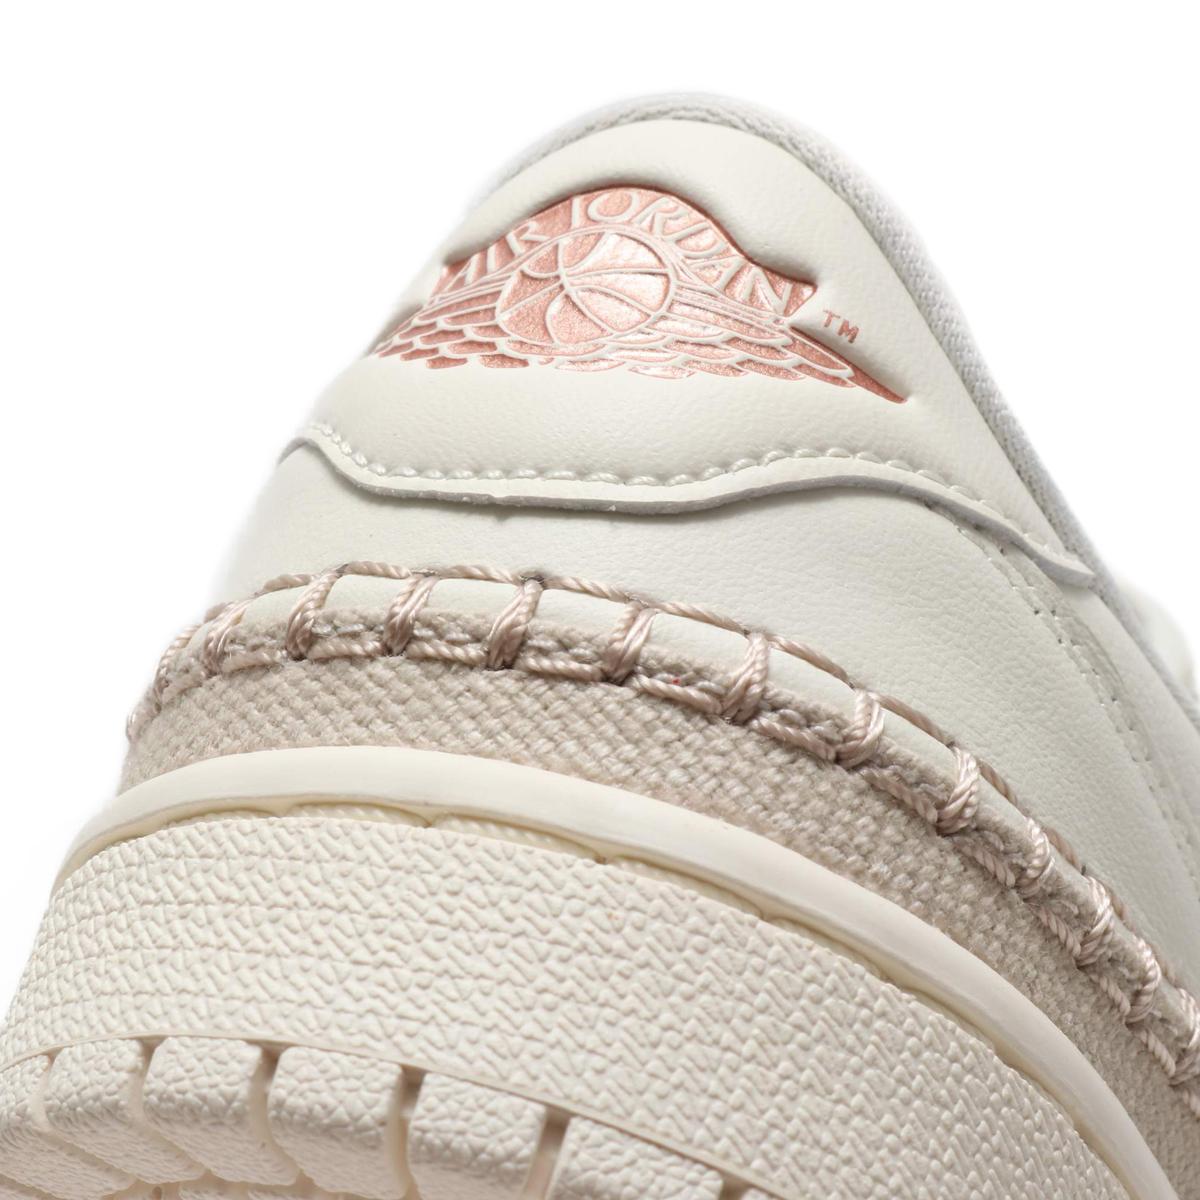 b2301387ac199a NIKE WMNS AIR JORDAN 1 RETRO LOW NS (Nike women Air Jordan 1 nostalgic low  NS) (SAIL MTLC RED BRONZE) 18SU-S